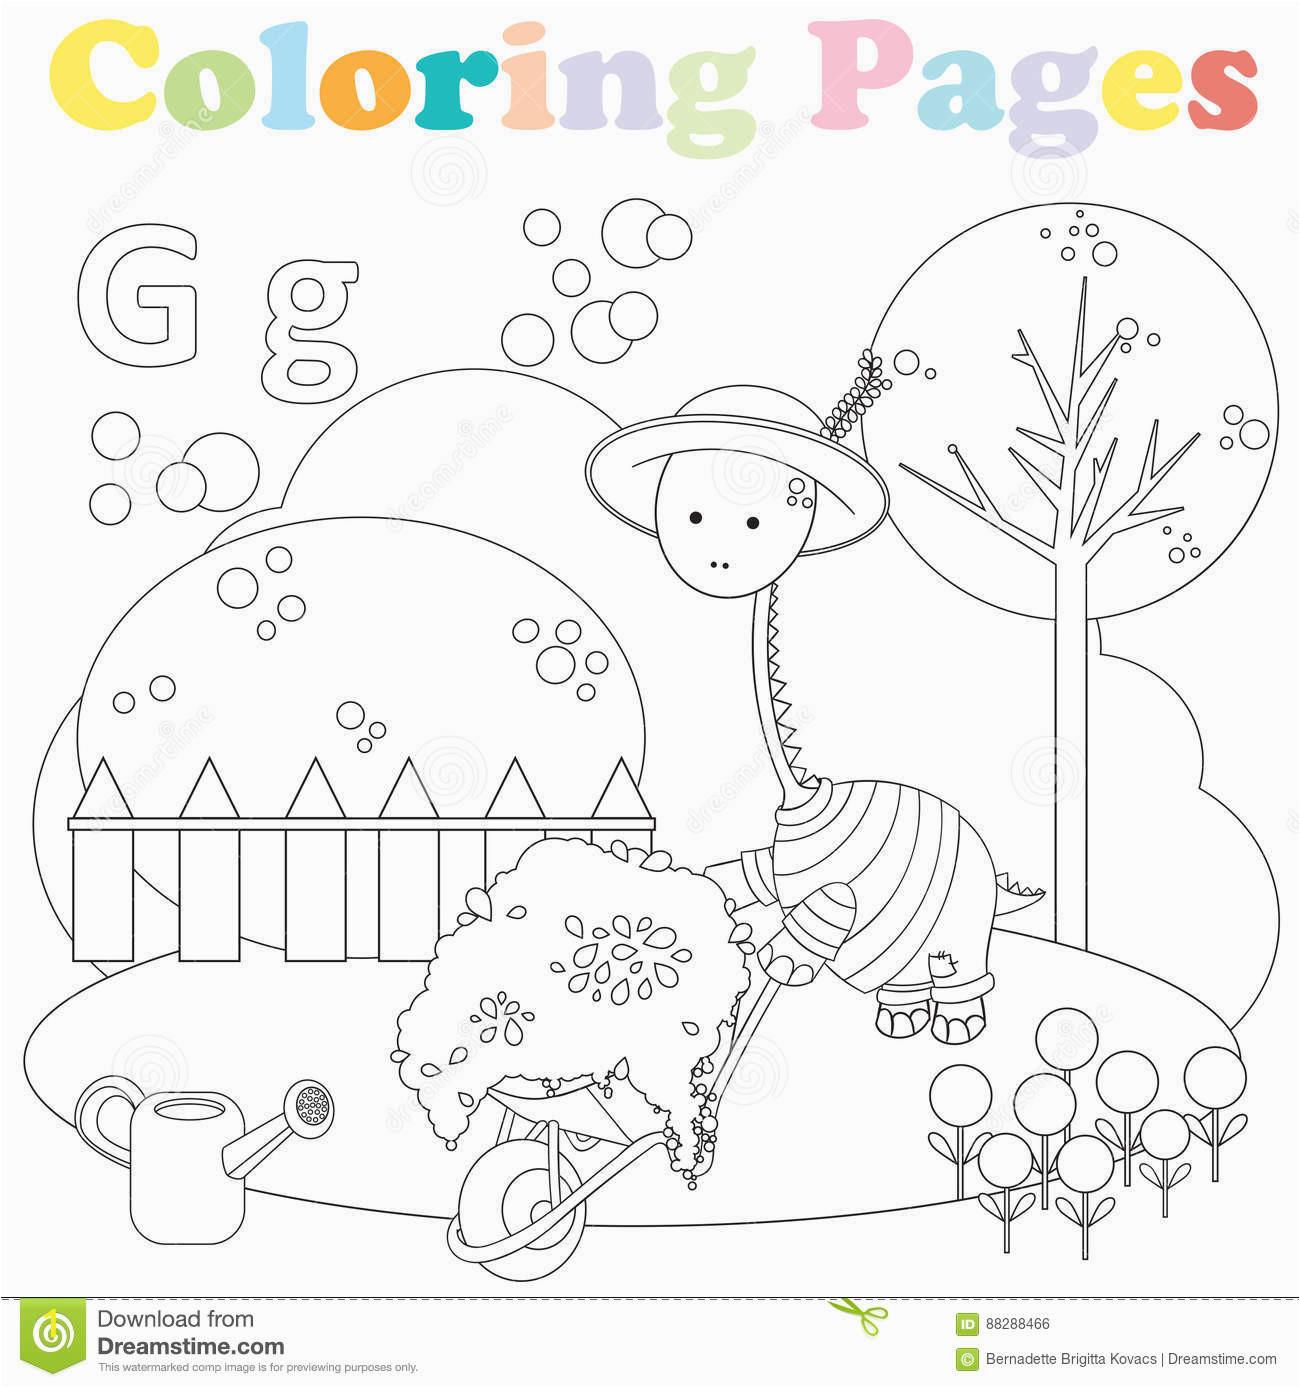 coloring page kids alphabet set letter g cute dinosaur yard gardening